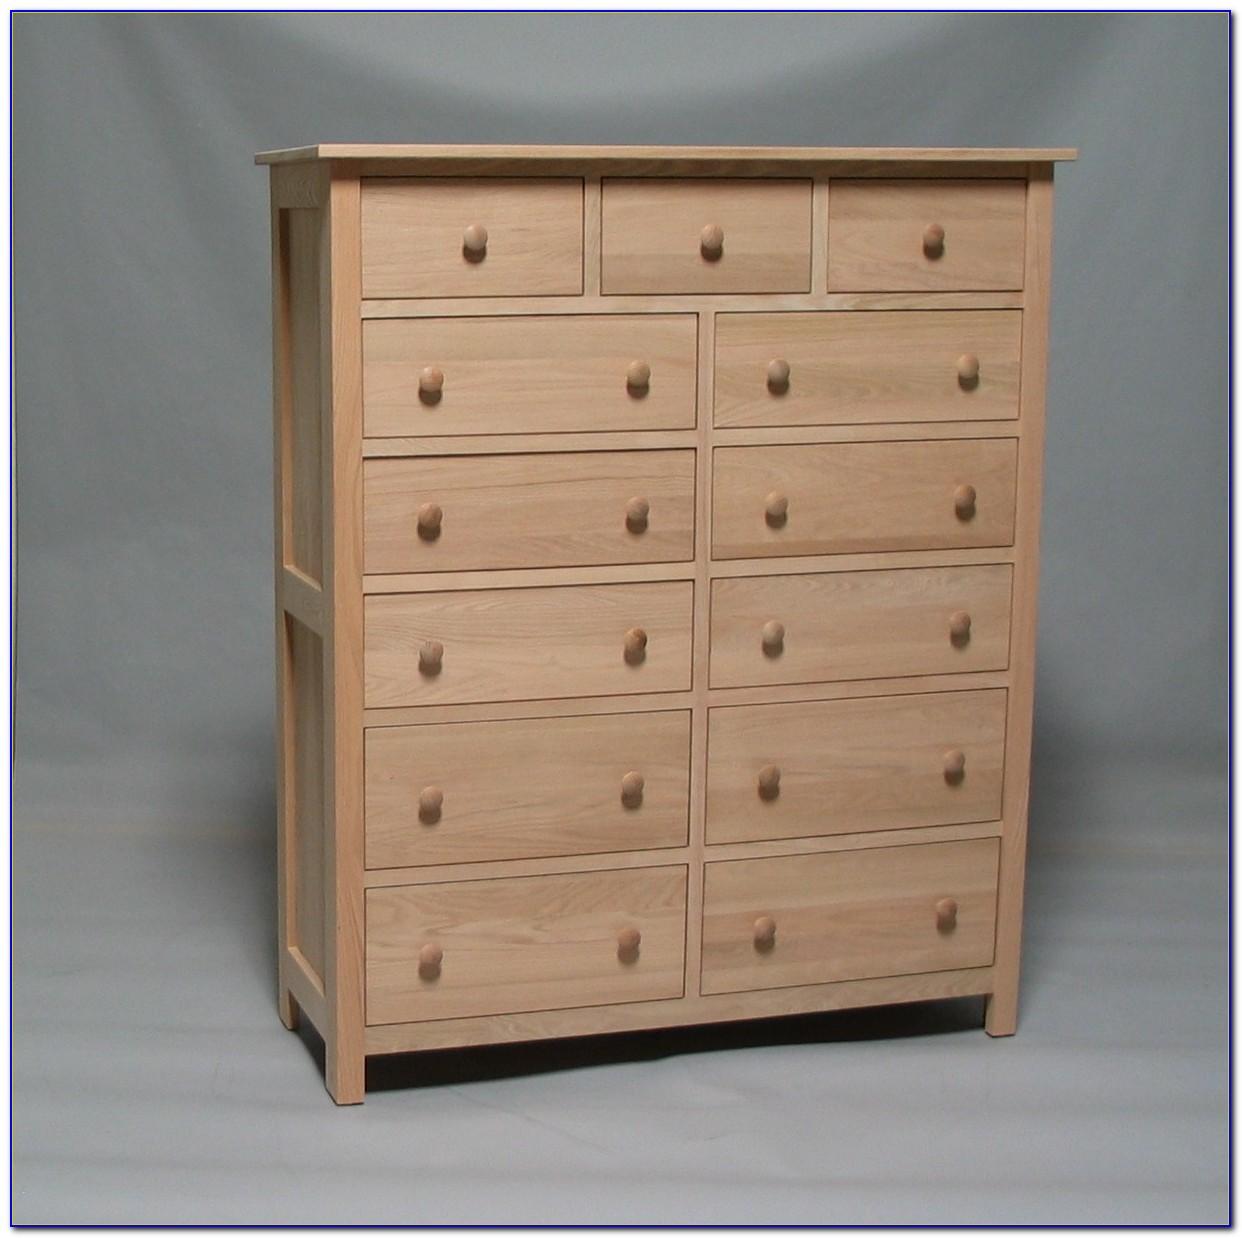 Bedroom Dresser With Deep Drawers